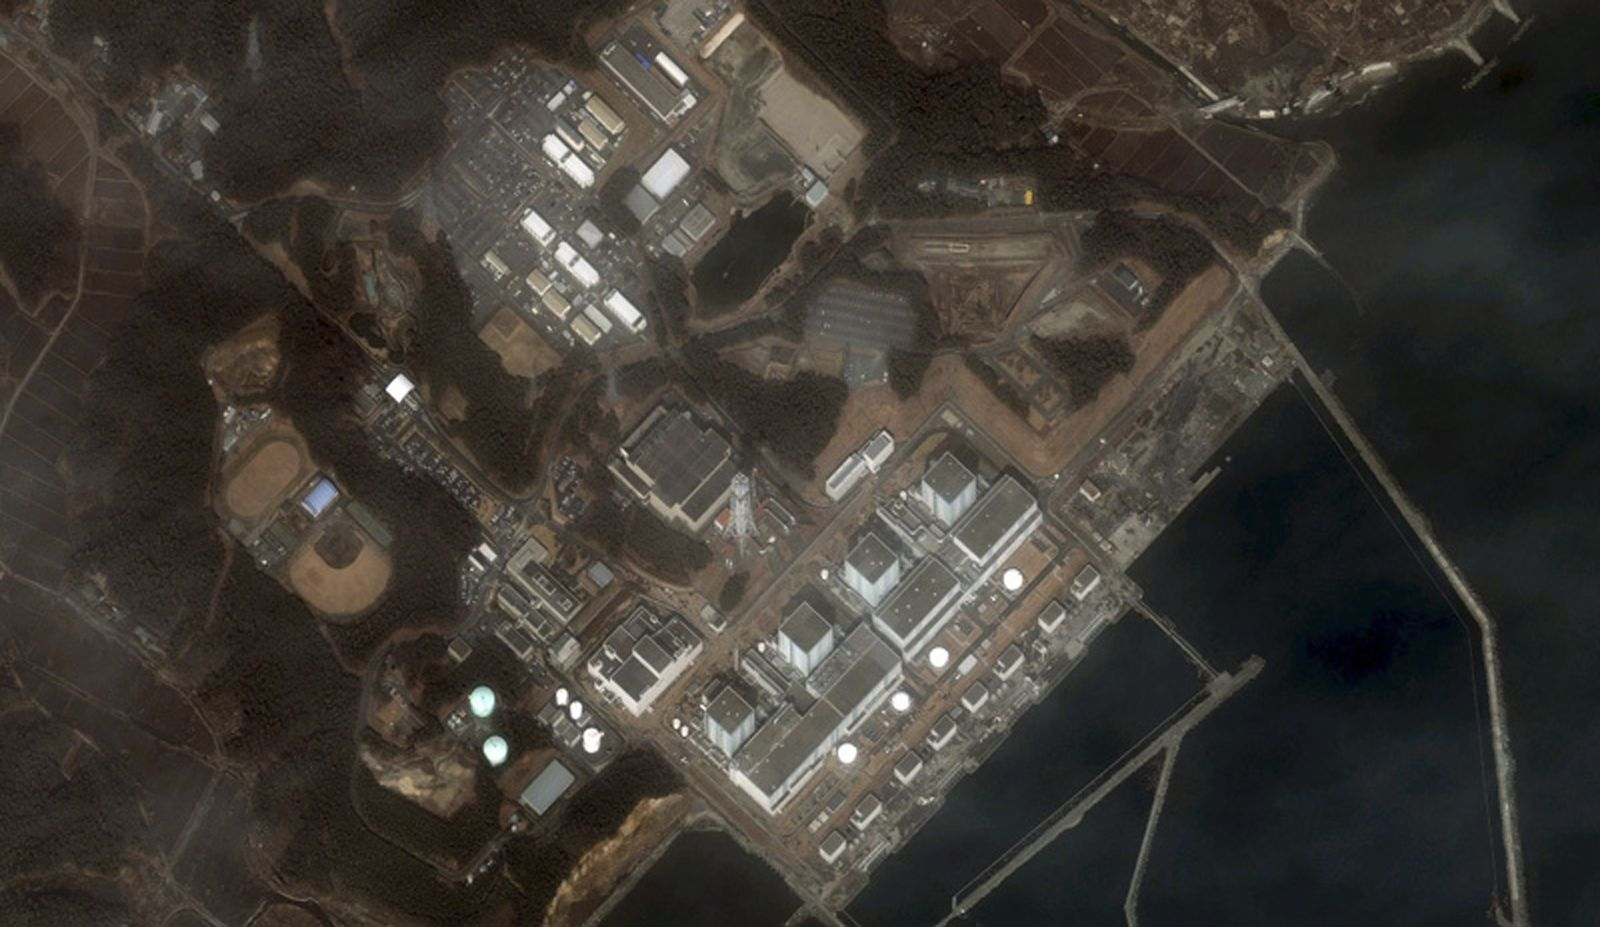 AKW Fukushima II (Daini)